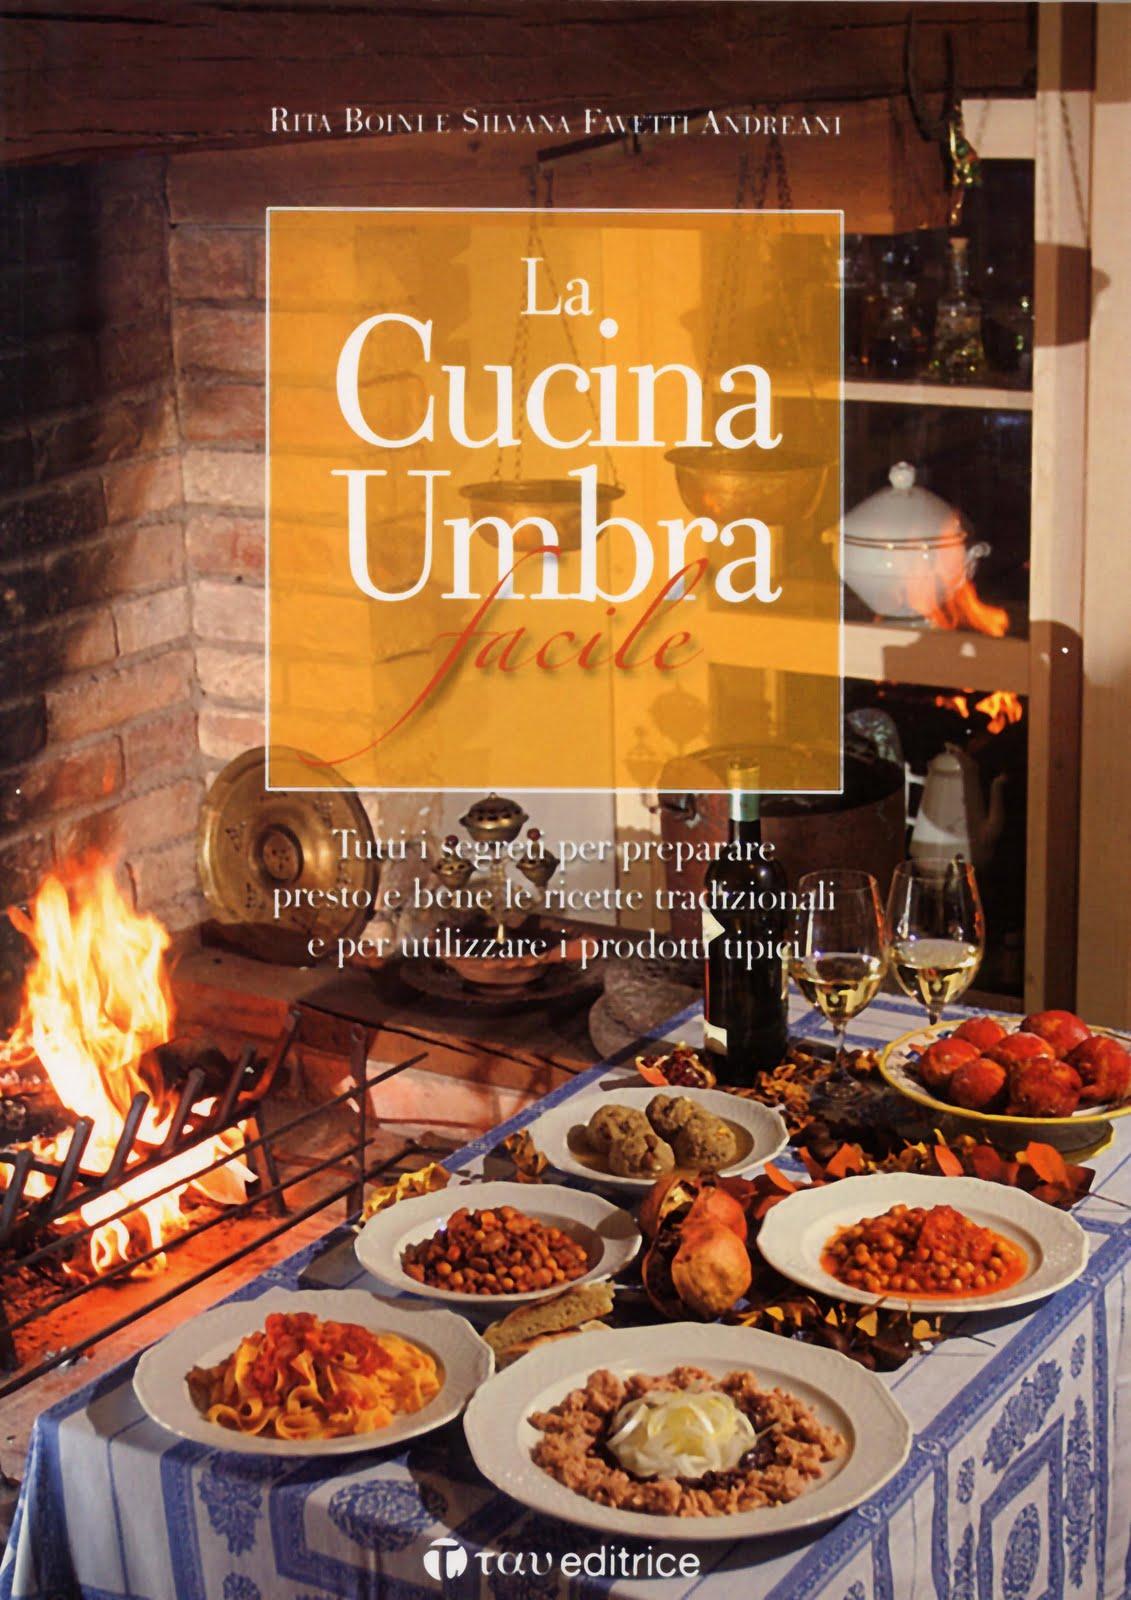 Gastronomia Andreani BLOG CANDY